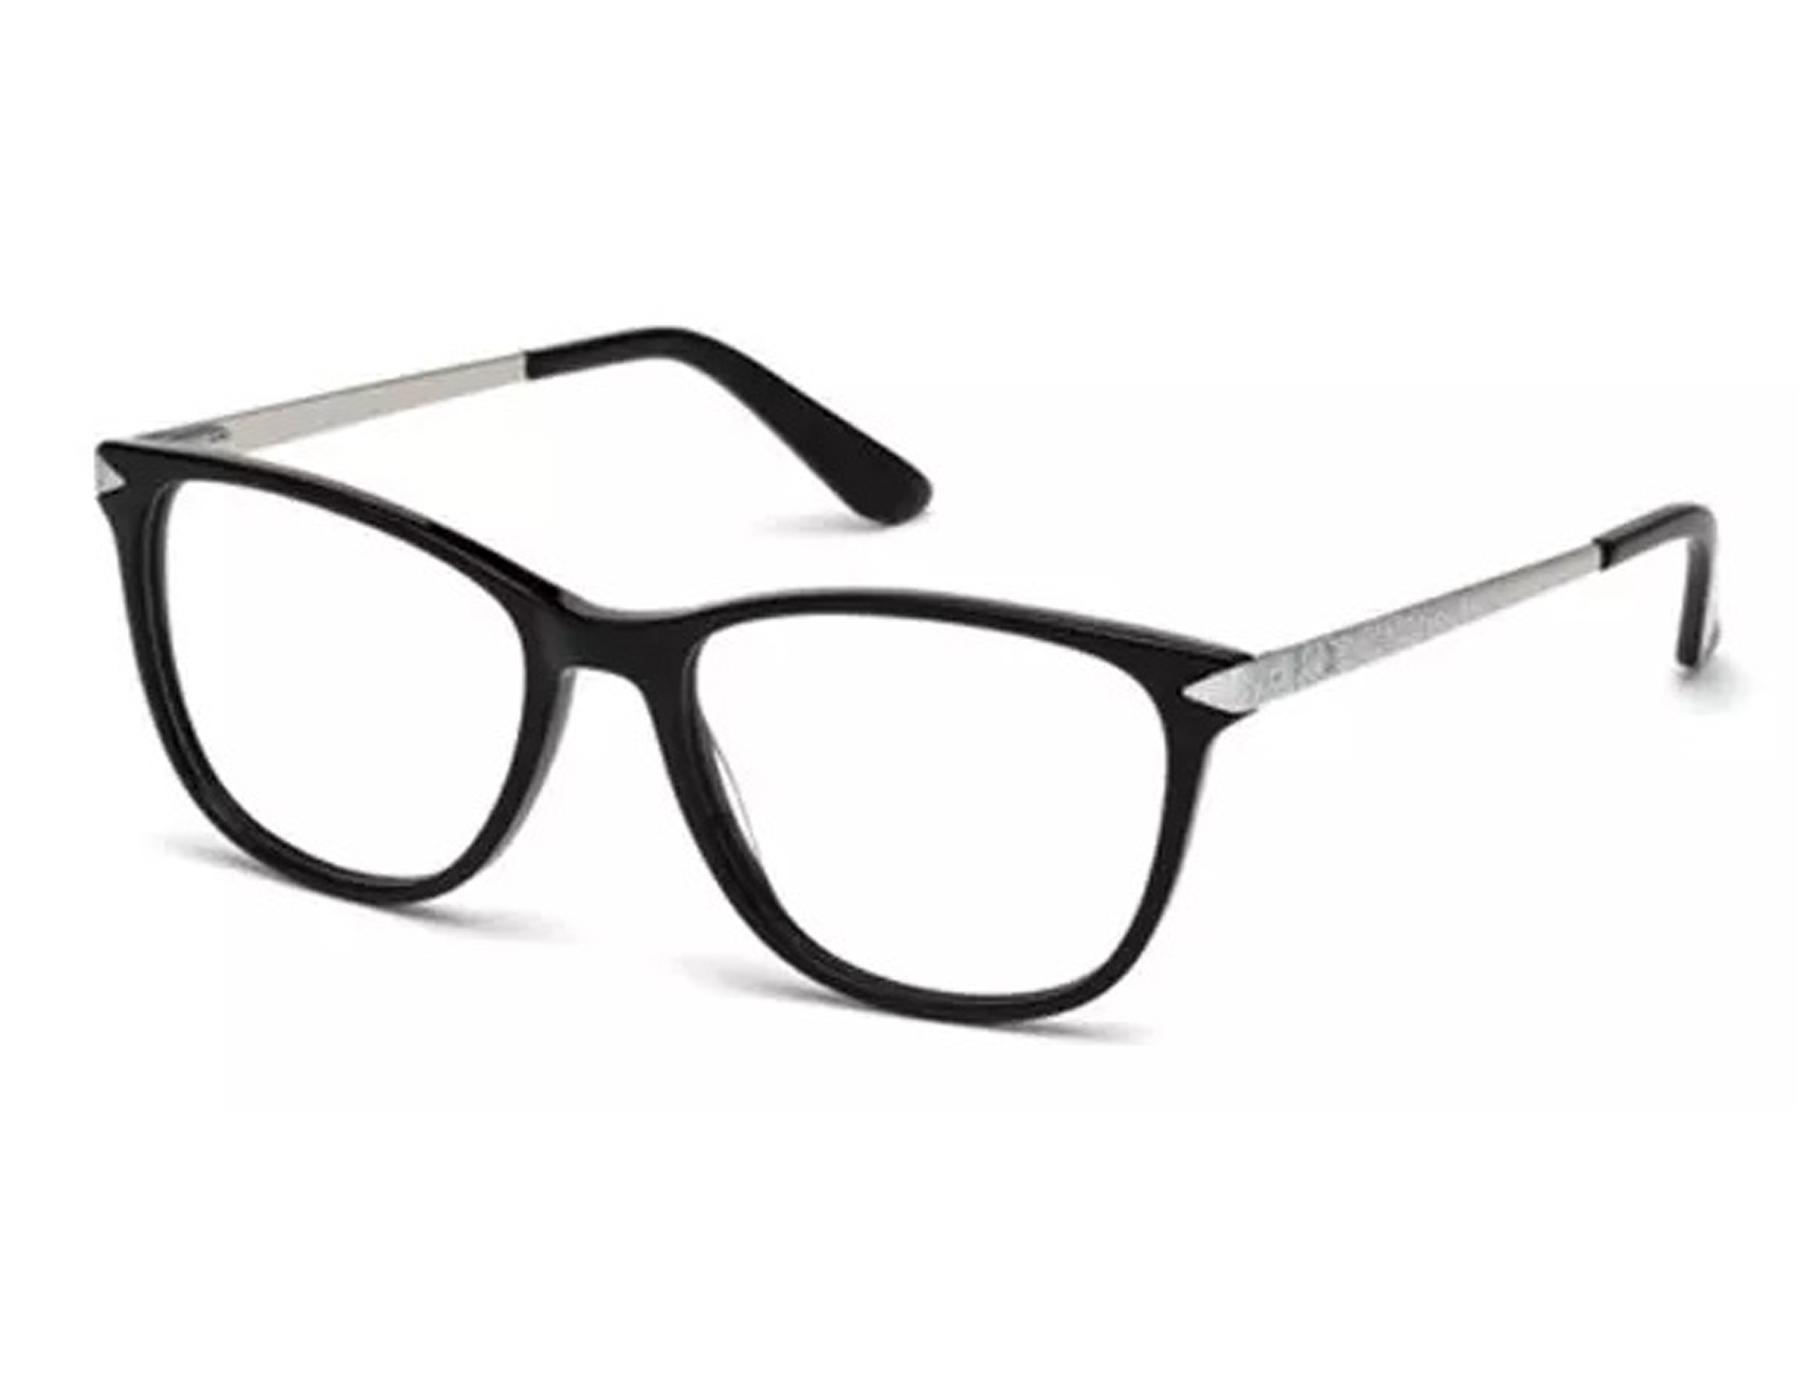 144dd5bdea Details about NEW Guess GU 2684 001 55mm Black Silver Optical Eyeglasses  Frames